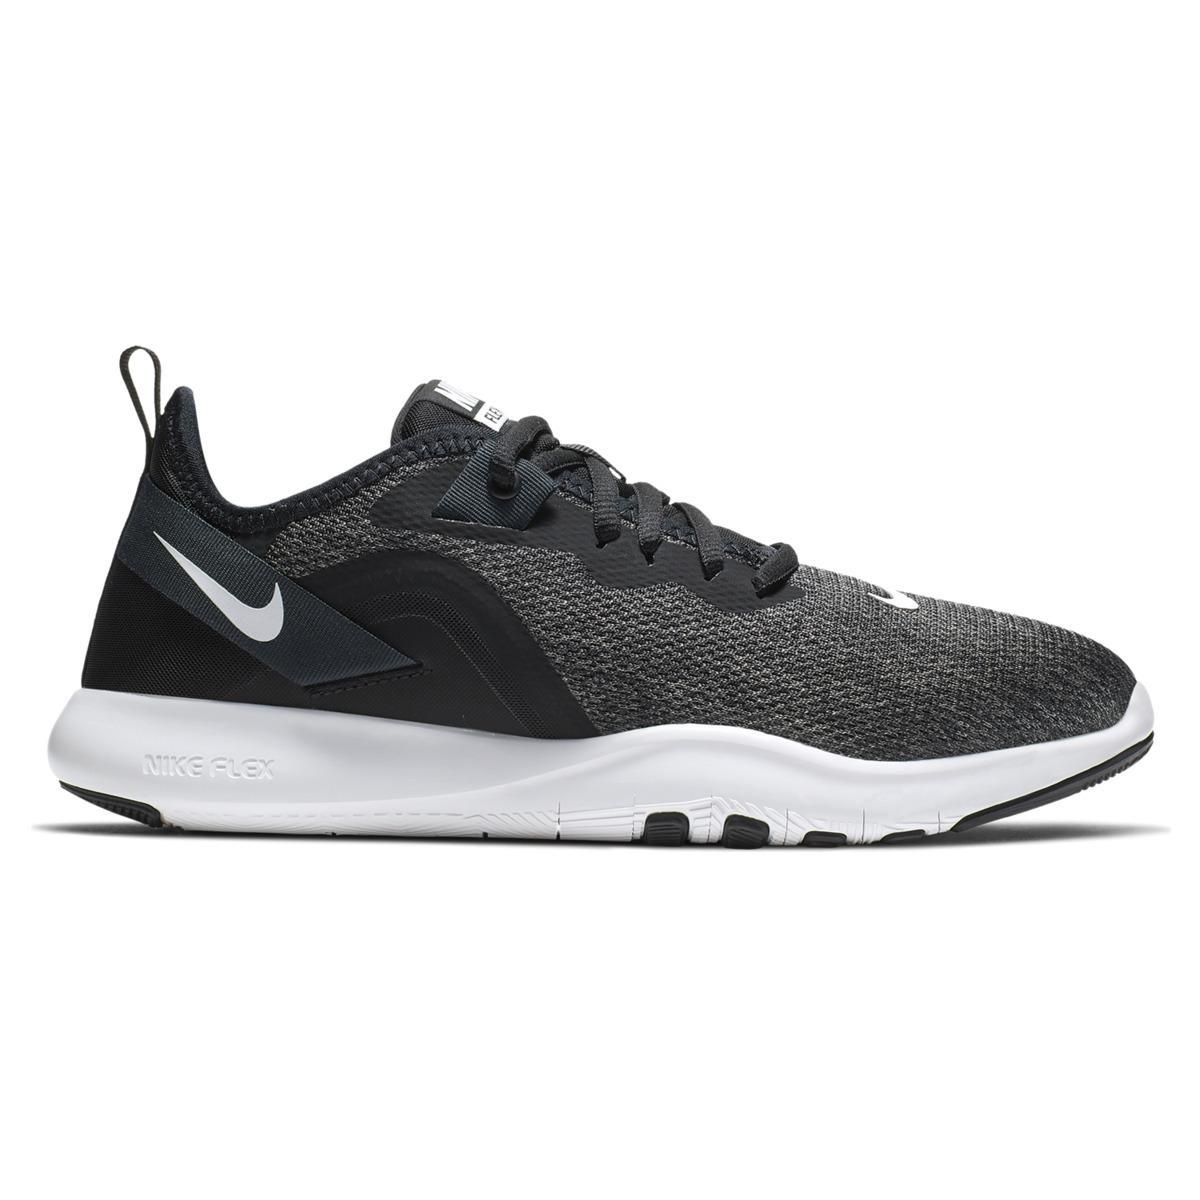 9358a5c29c33 Nike. Women s Black Flex Tr 9 Fitness cross Training Shoes.  79 From El  Corte Ingles